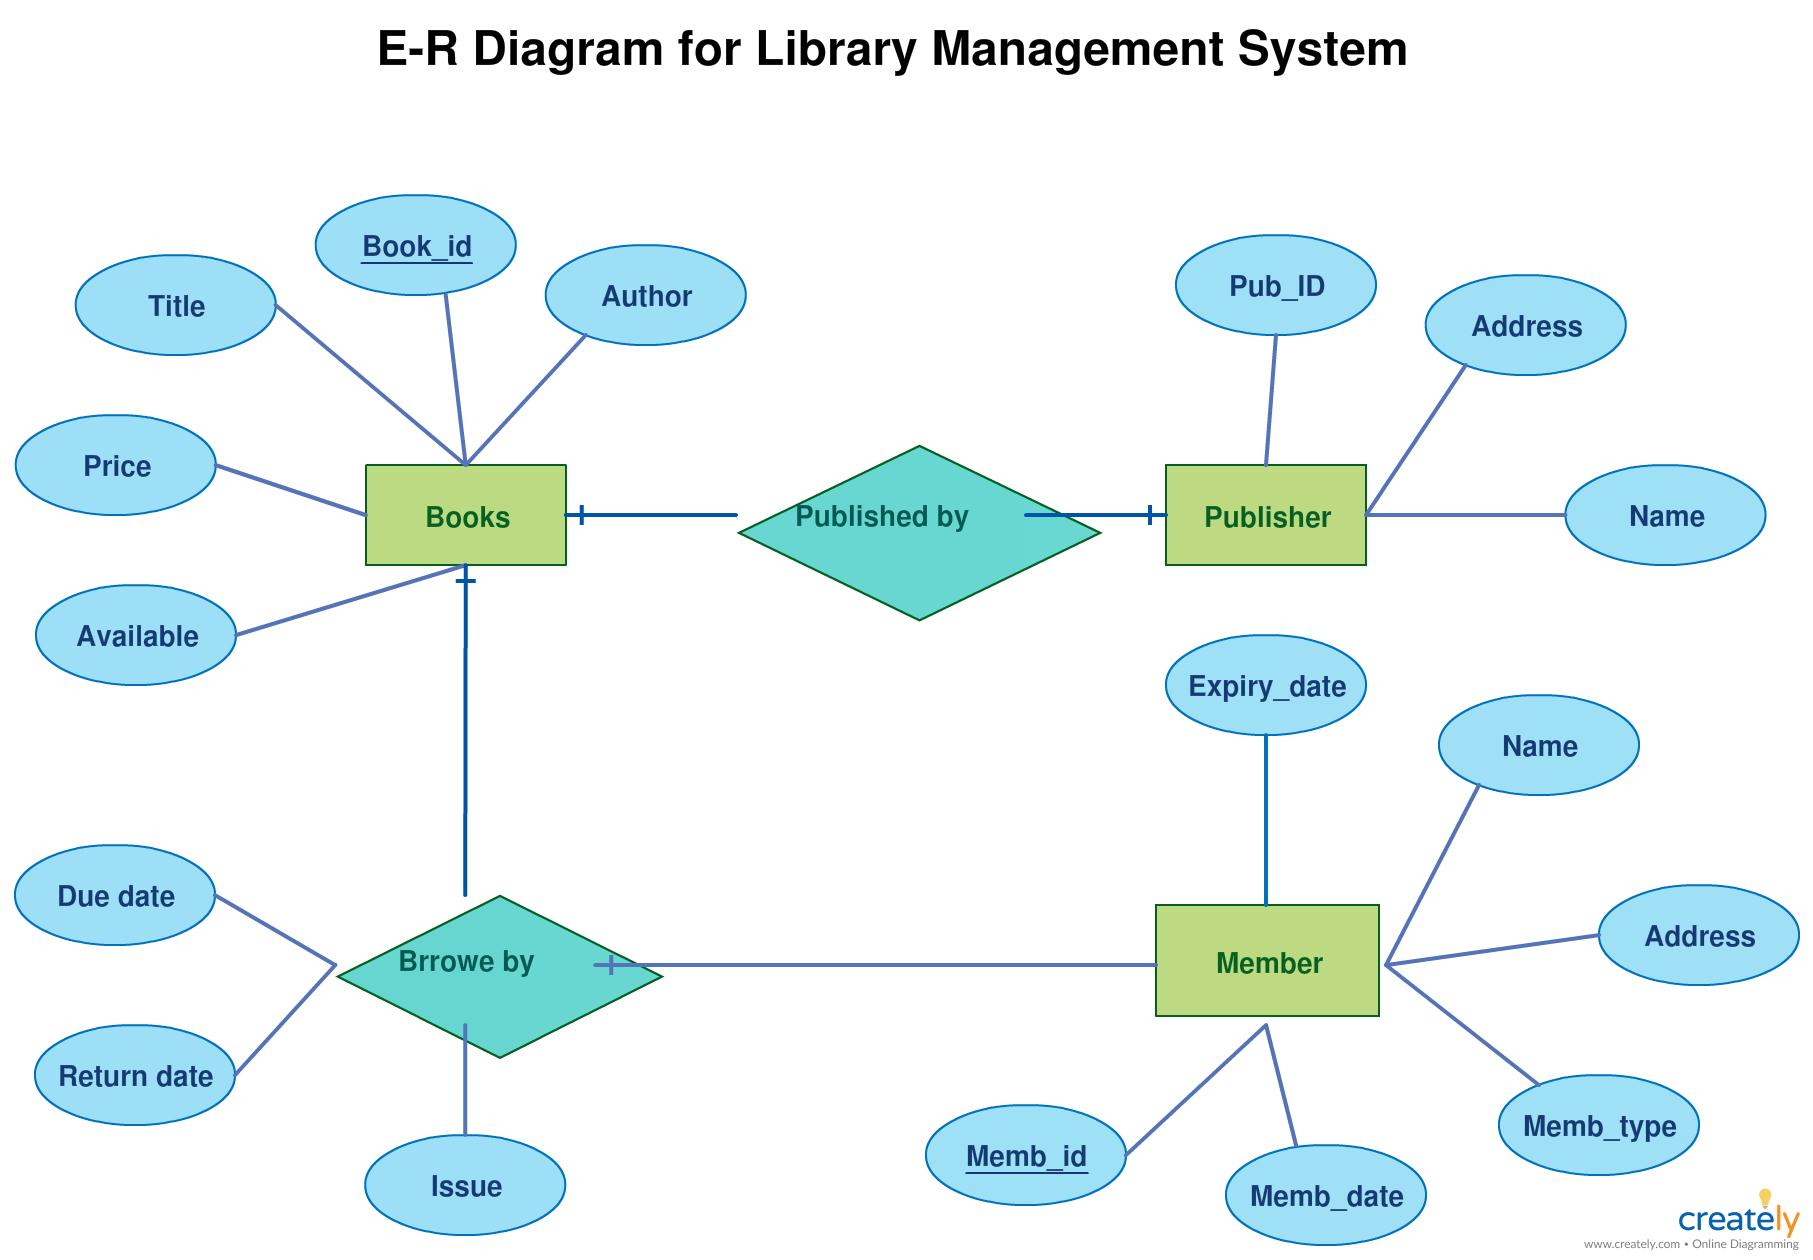 Er Diagram Tutorial | Data Flow Diagram, Diagram, Class Diagram with Drawing Er Diagrams